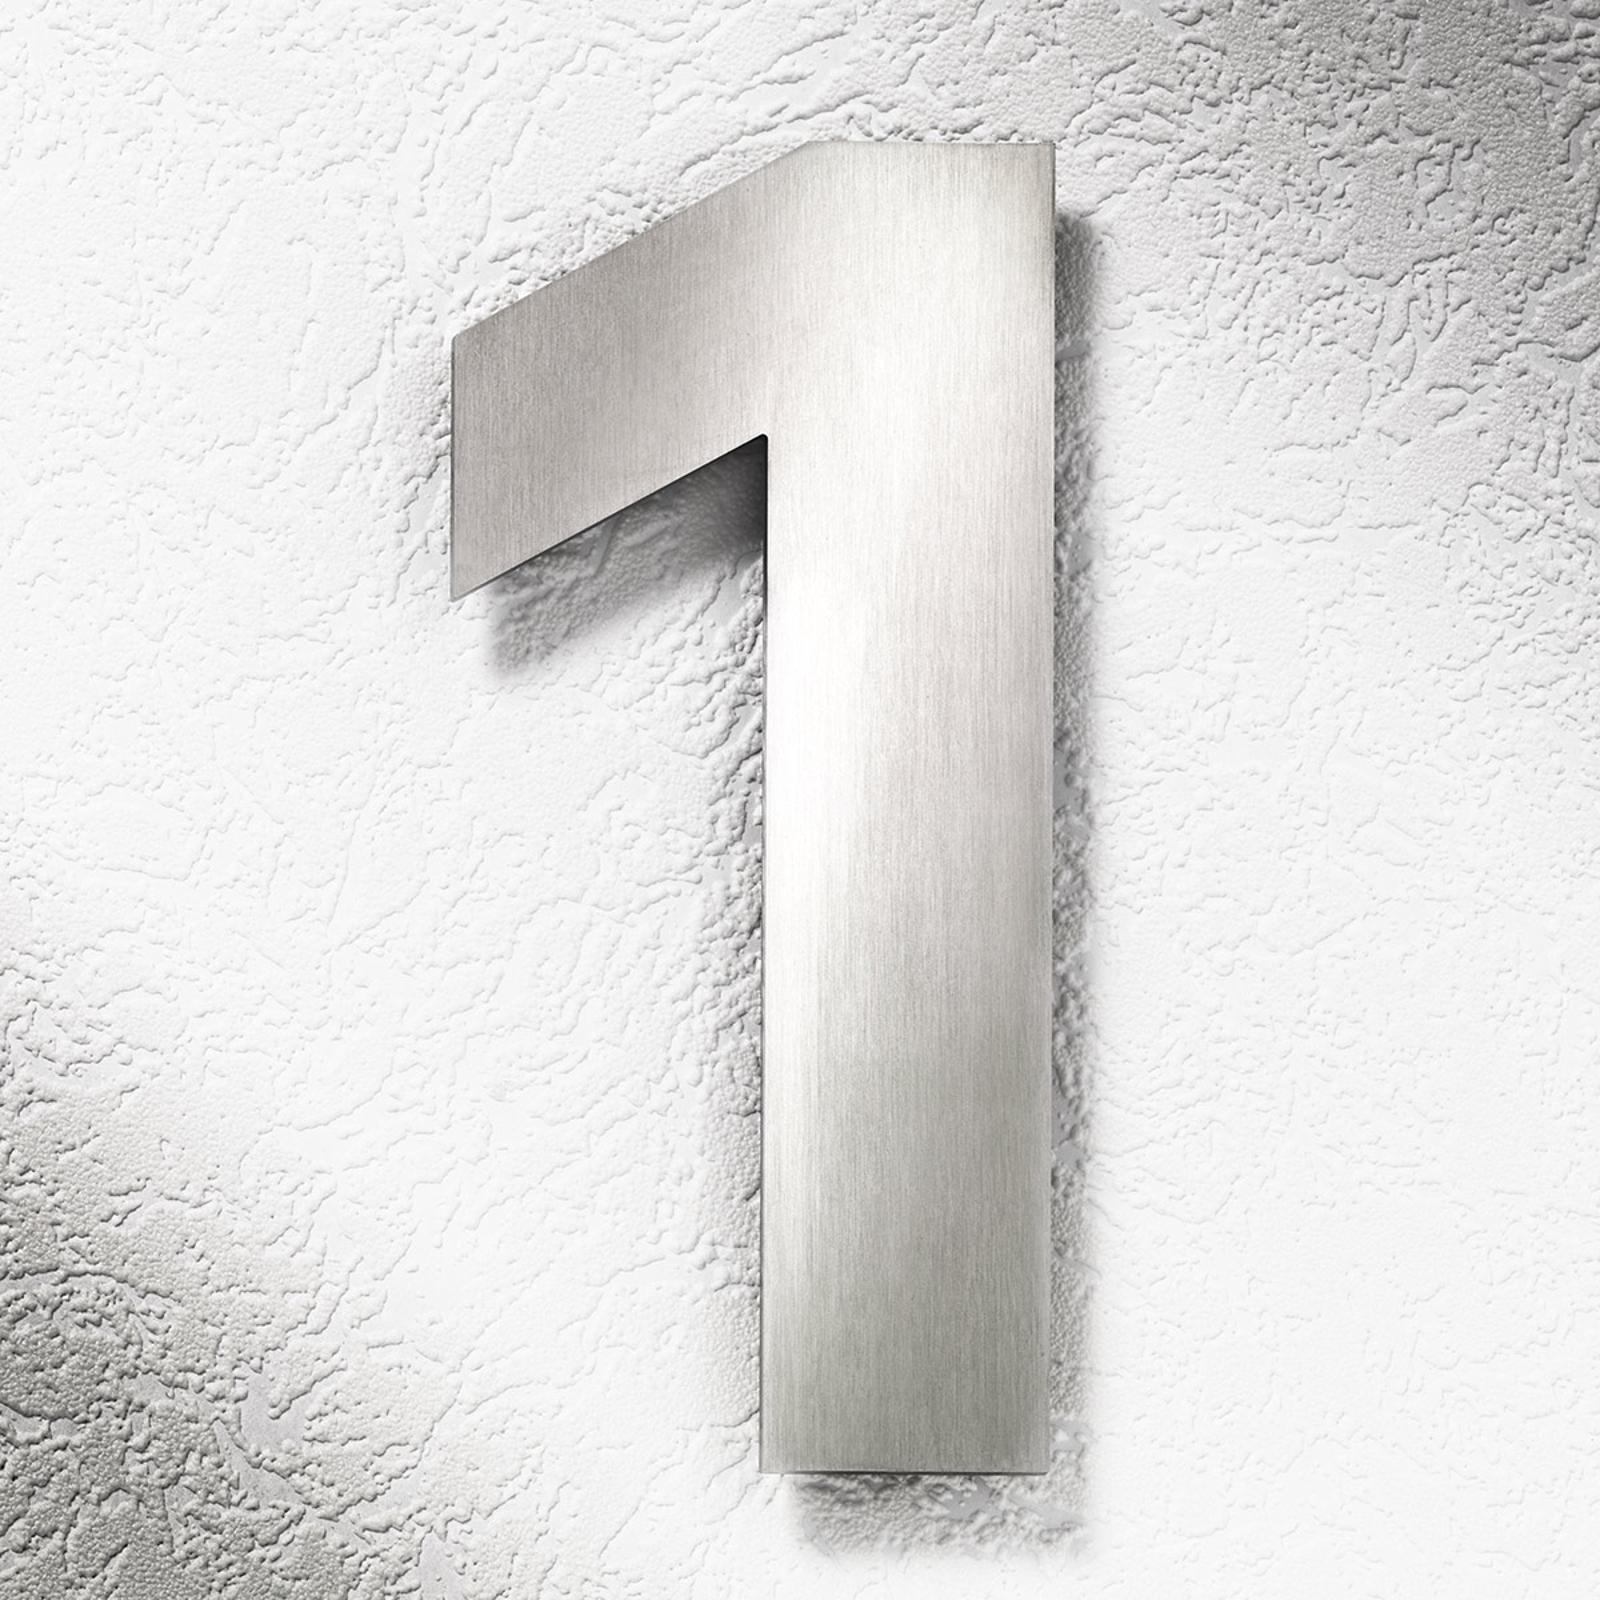 Numeri civici in acciaio inox grandi 1